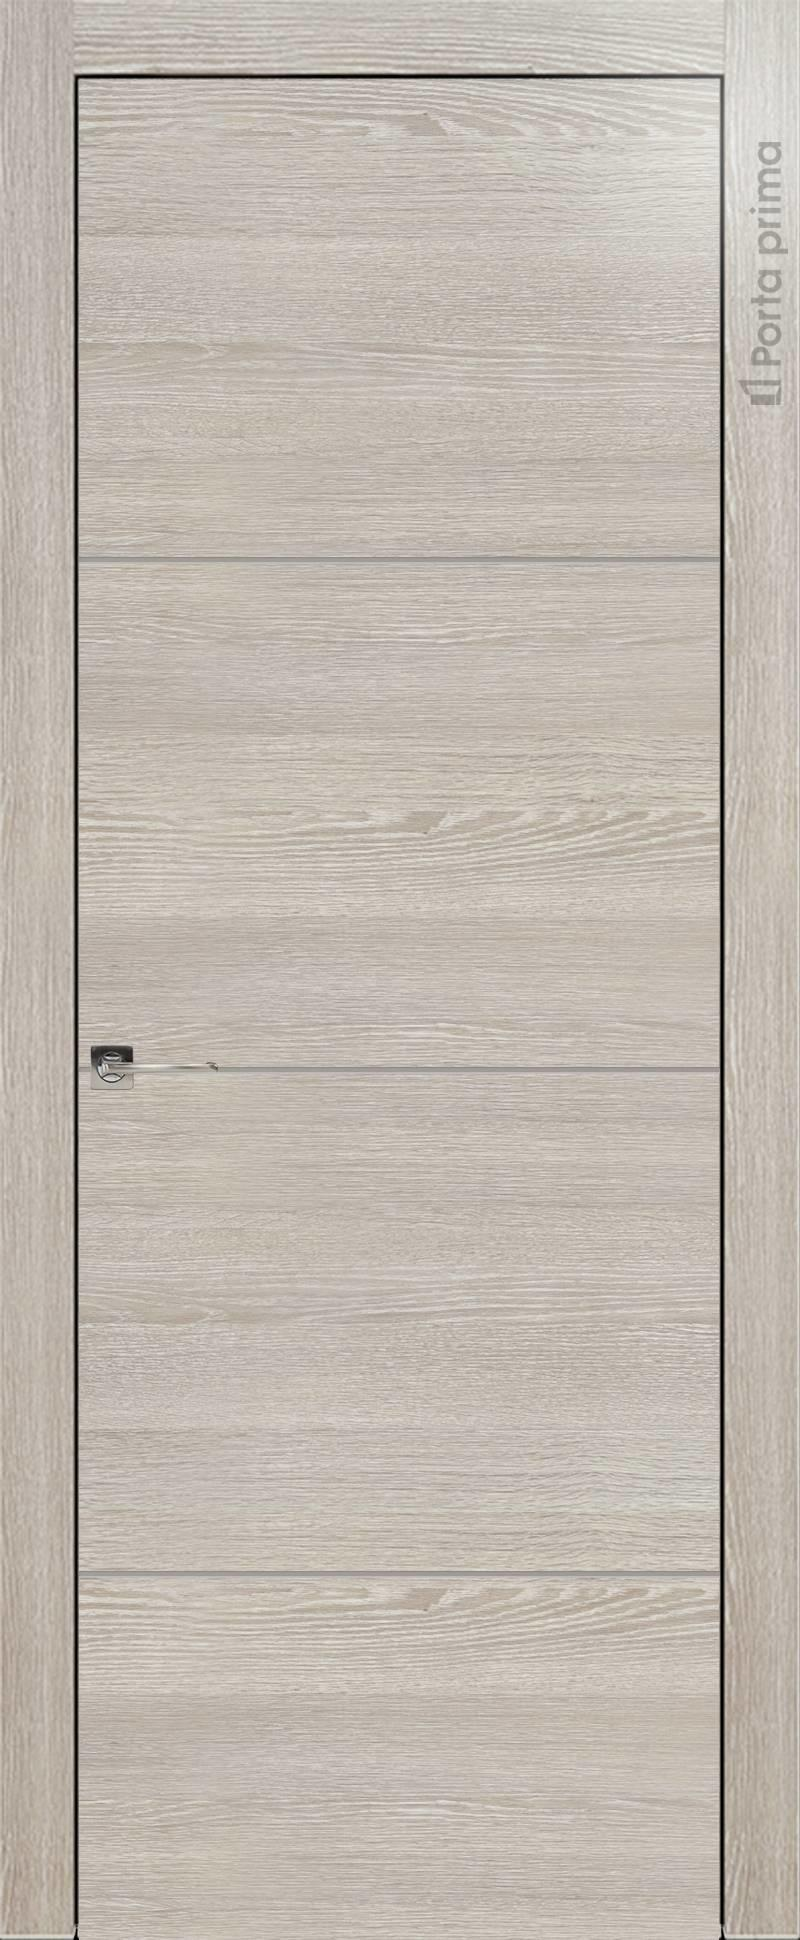 Tivoli Г-2 цвет - Серый дуб Без стекла (ДГ)